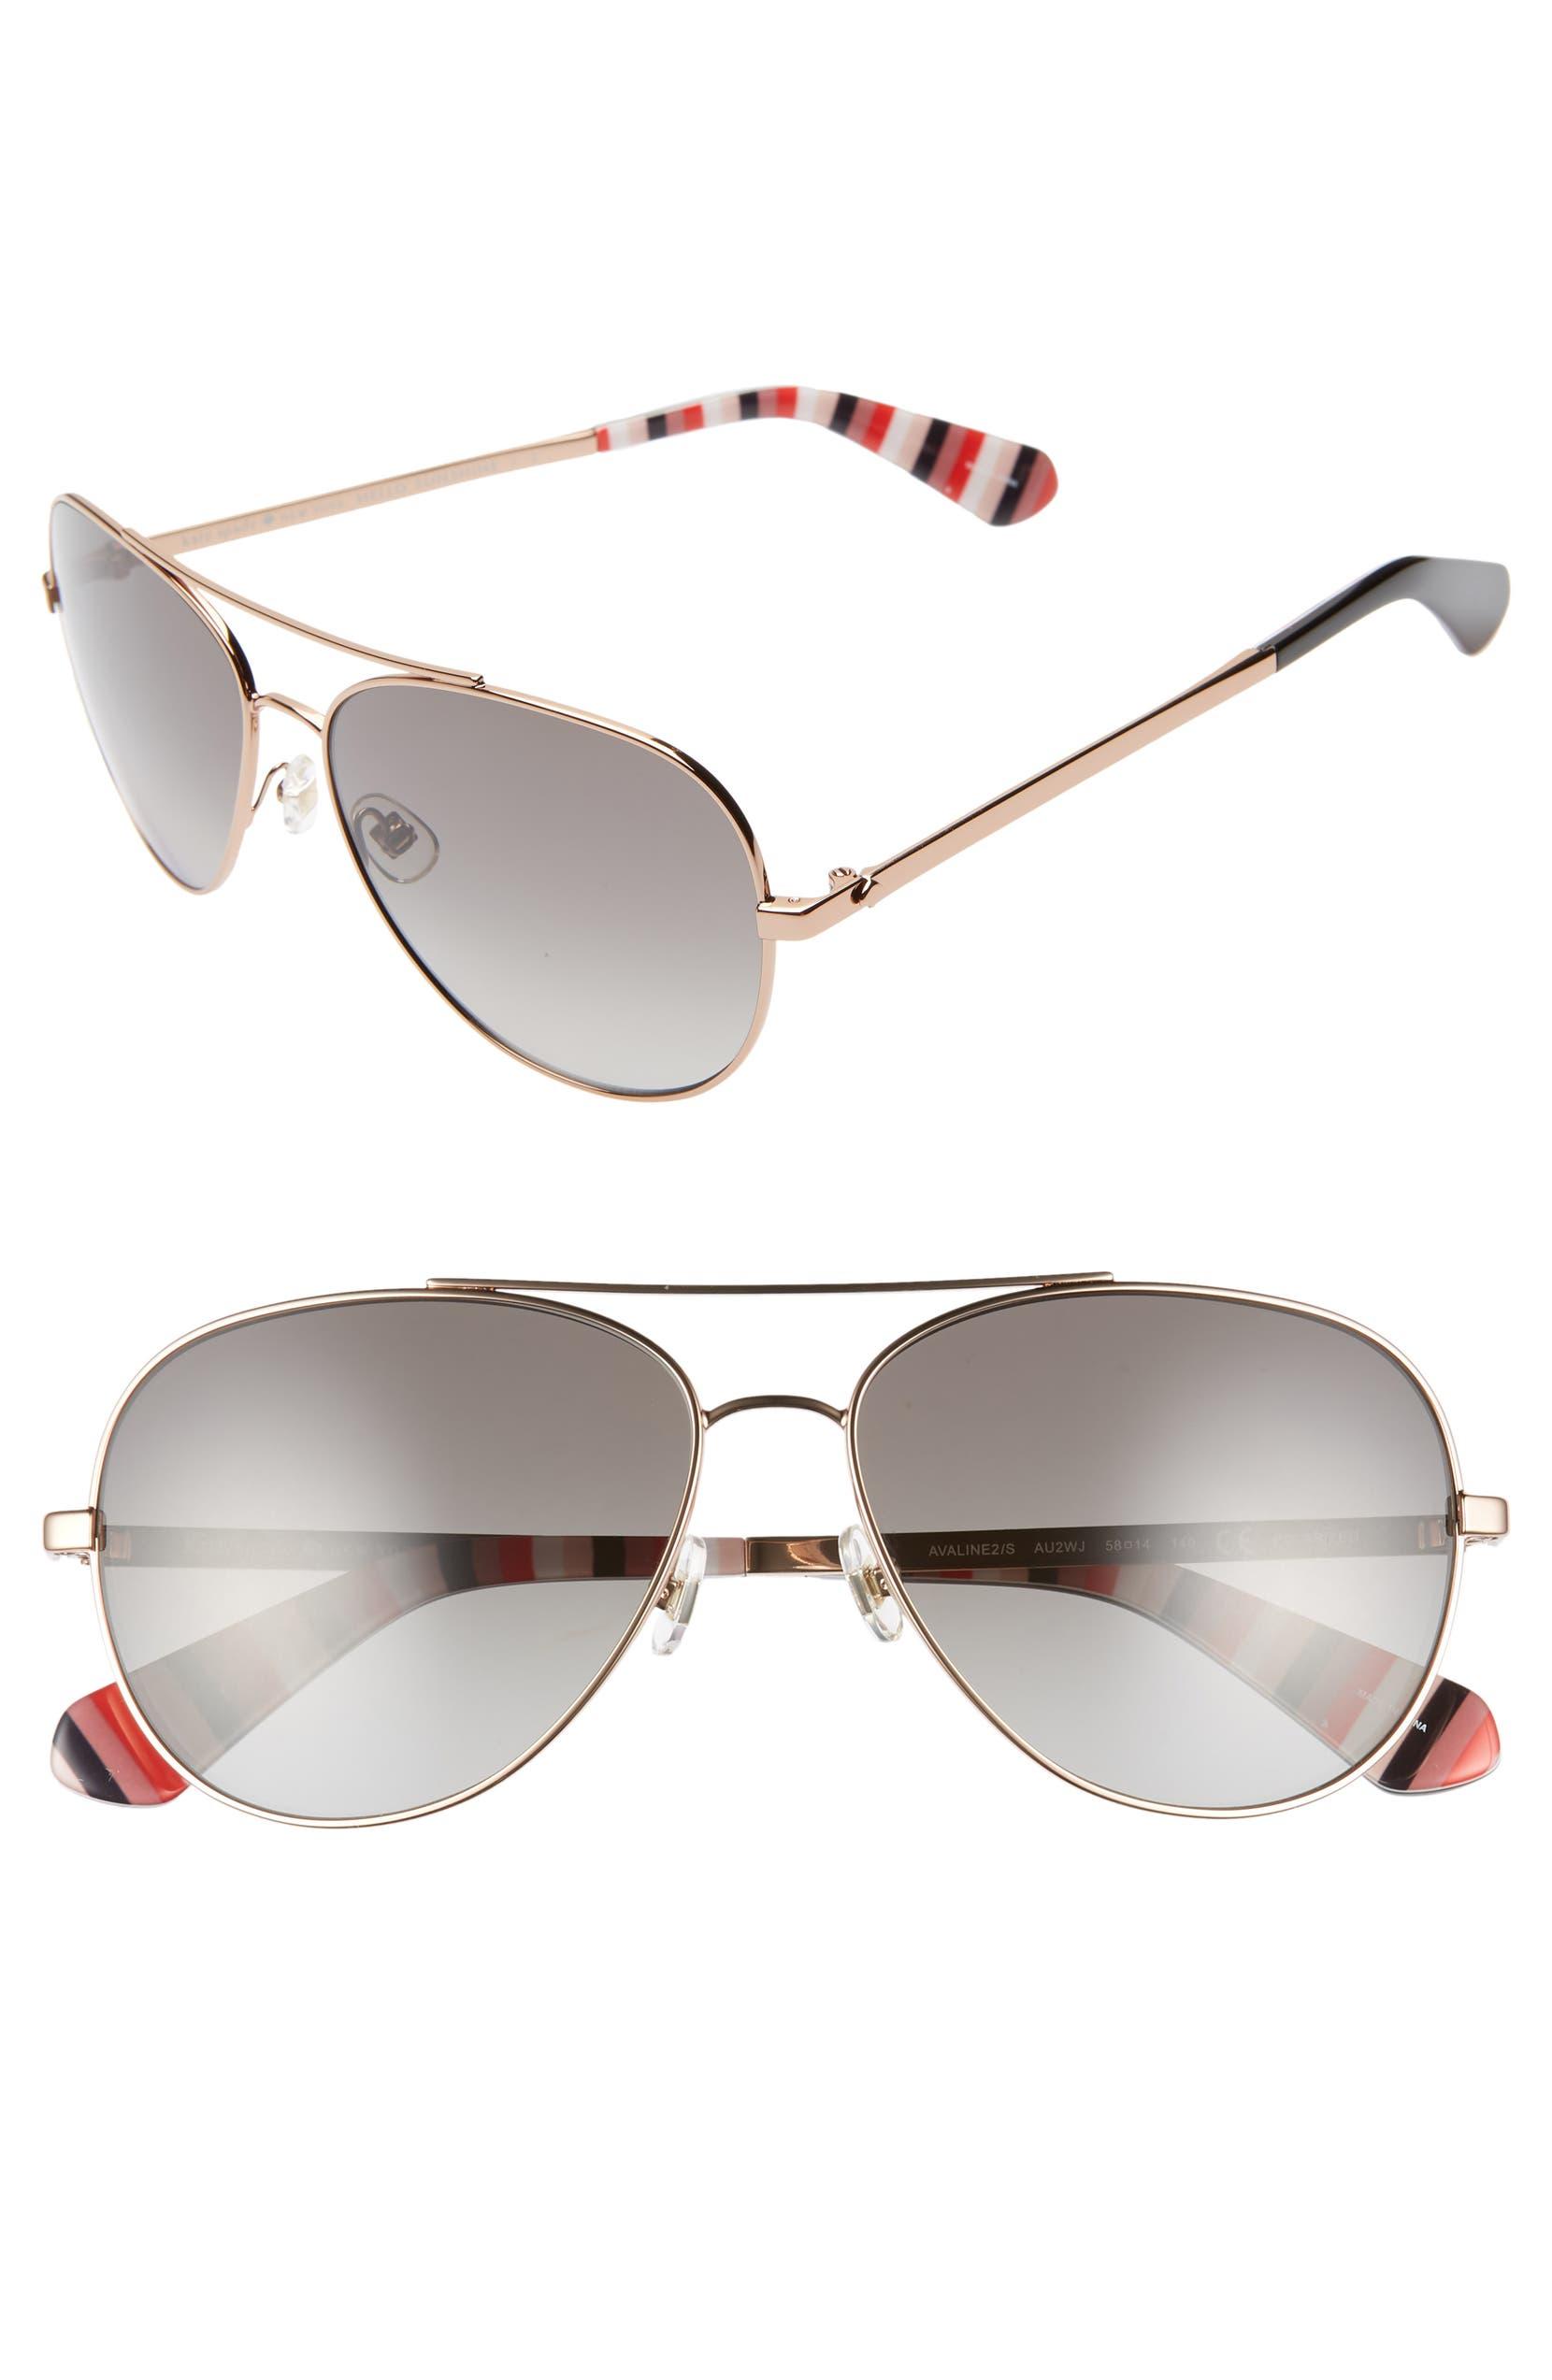 fd9f3b9375 kate spade new york avaline 2 58mm polarized aviator sunglasses ...